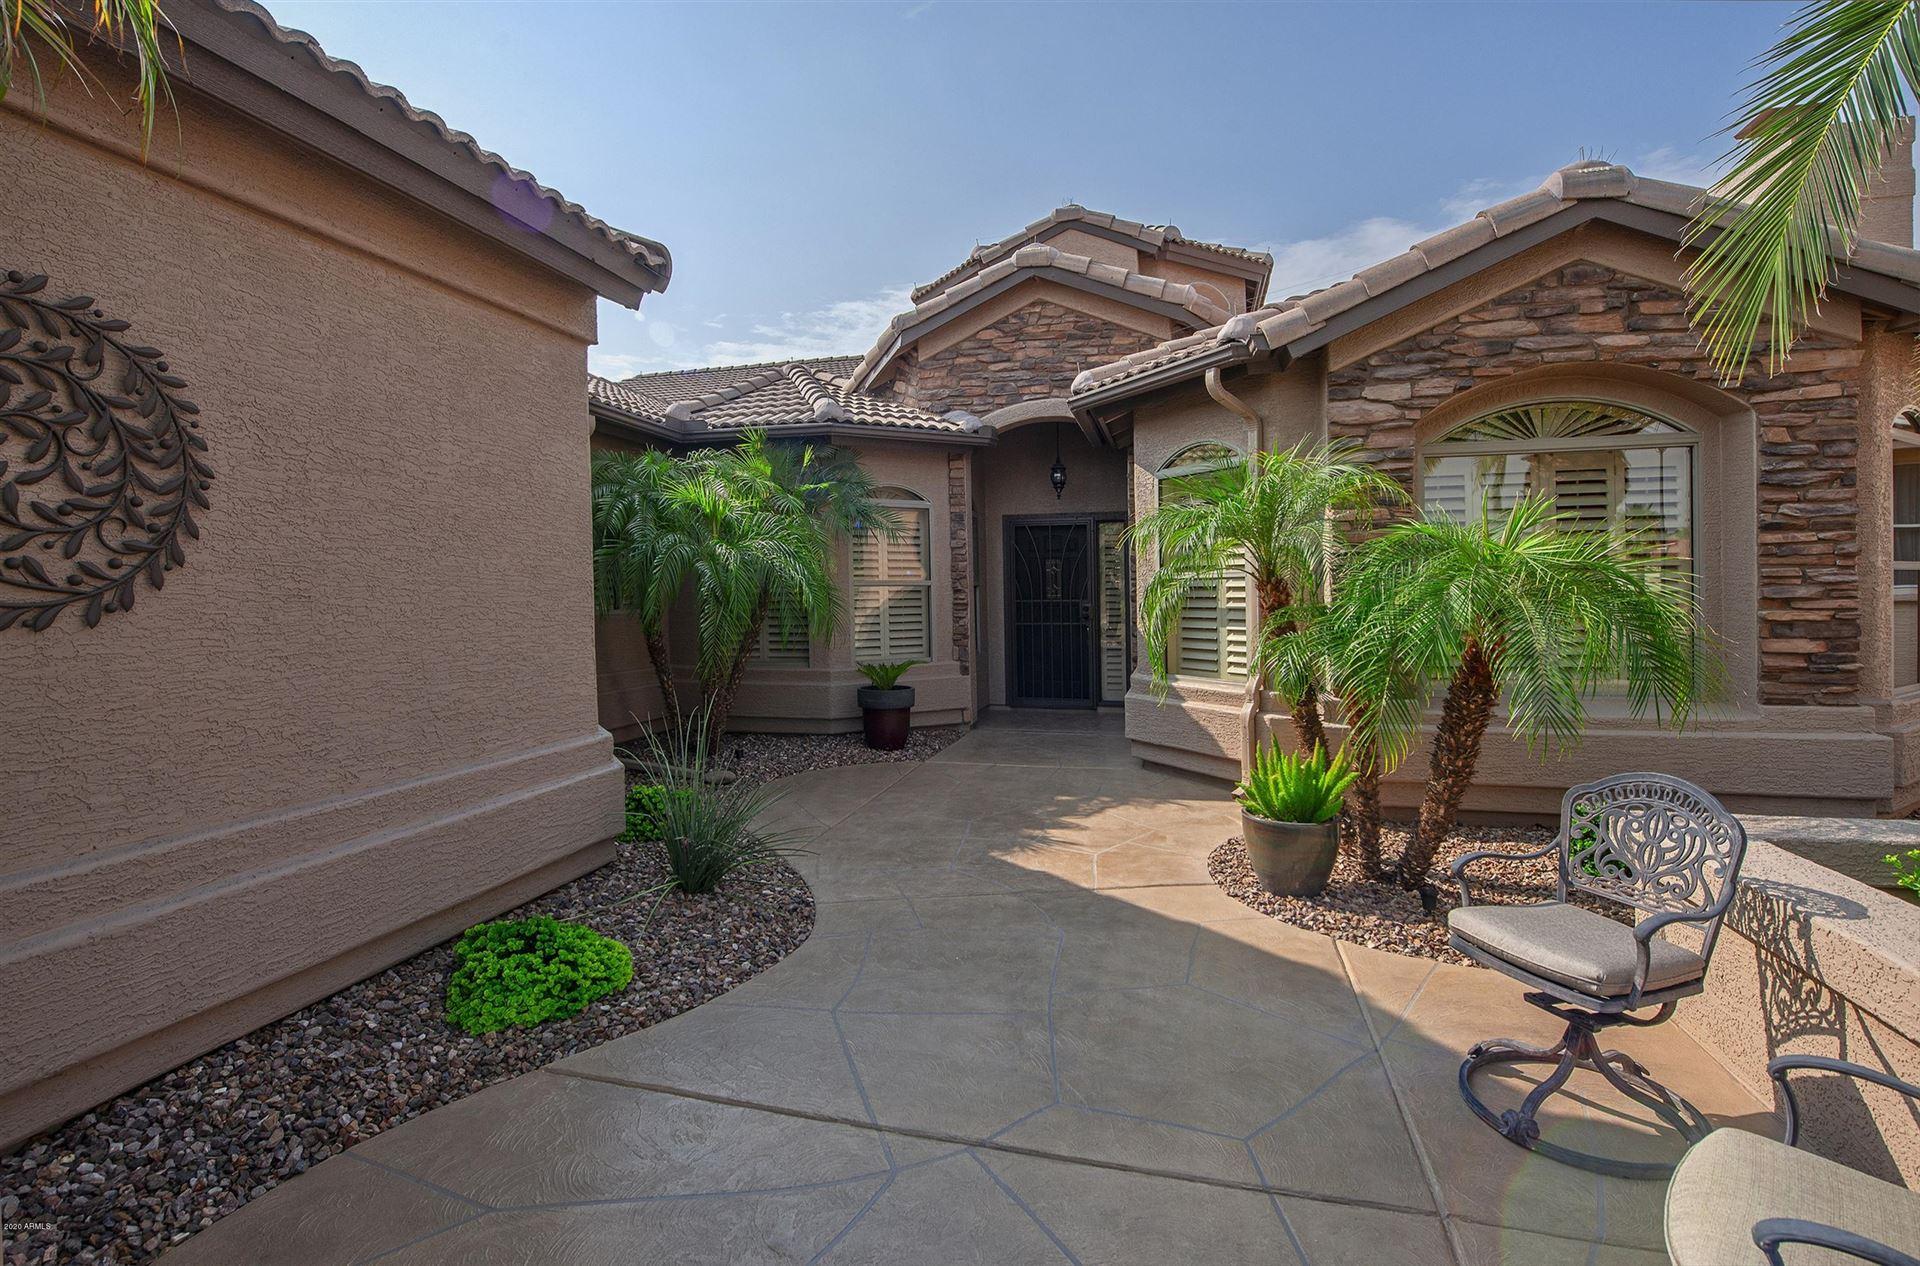 14883 W CRENSHAW Drive, Goodyear, AZ 85395 - MLS#: 6108968